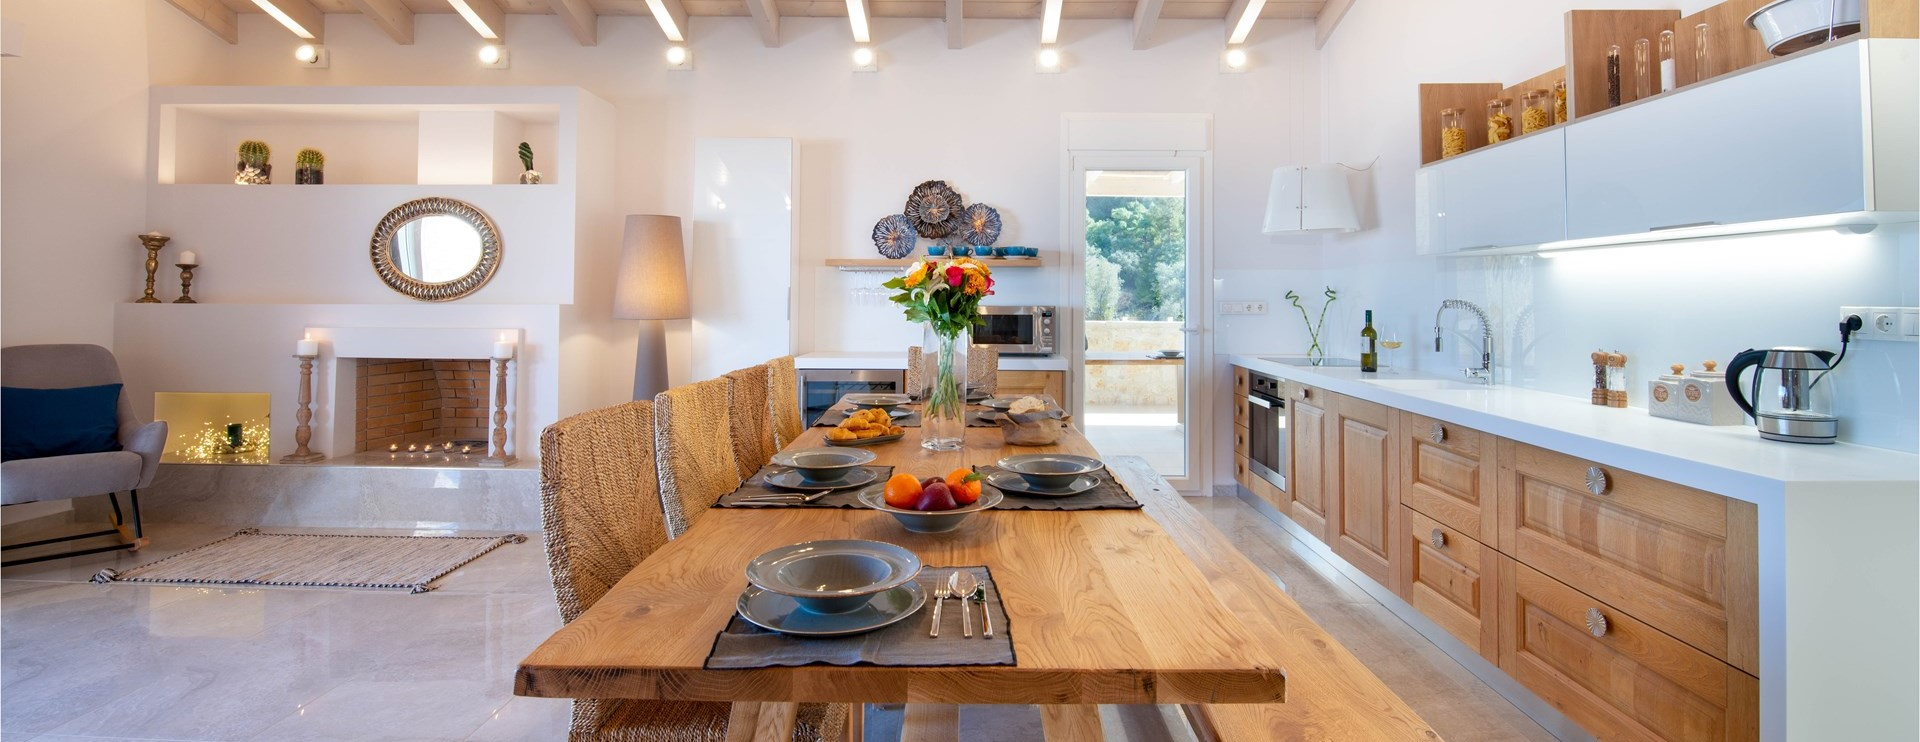 nero-beach-house-kitchen-dining